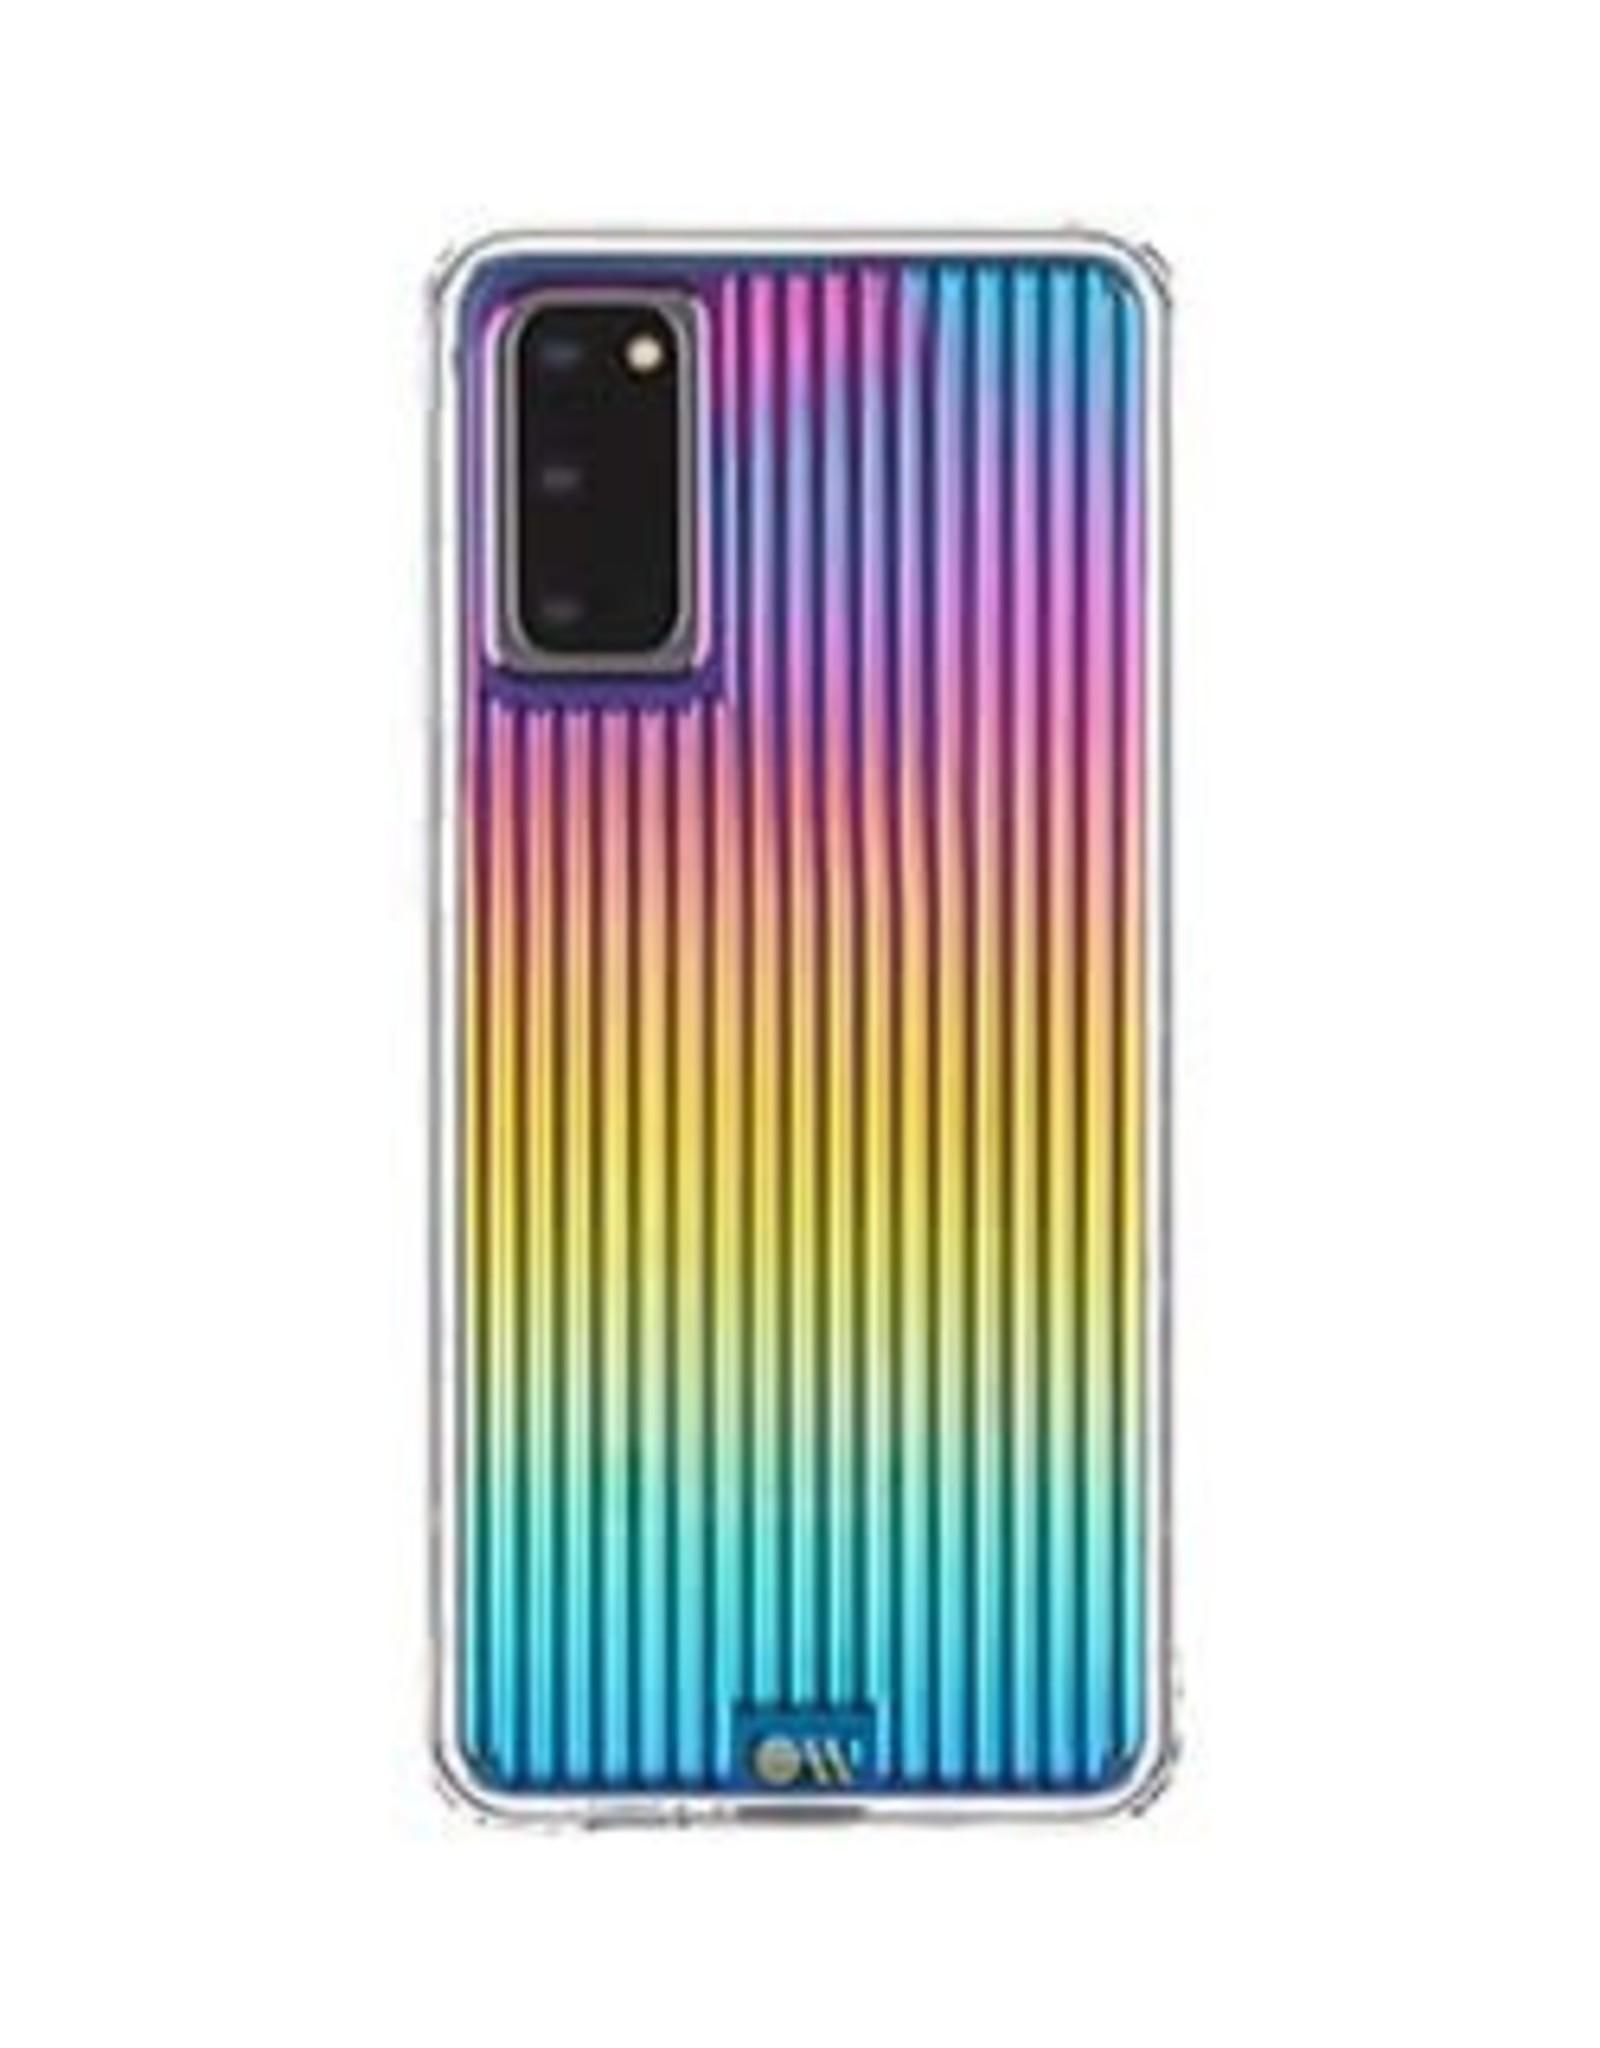 Case-Mate Case-Mate | Samsung Galaxy S20  Iridescent Tough Groove Case15-06660